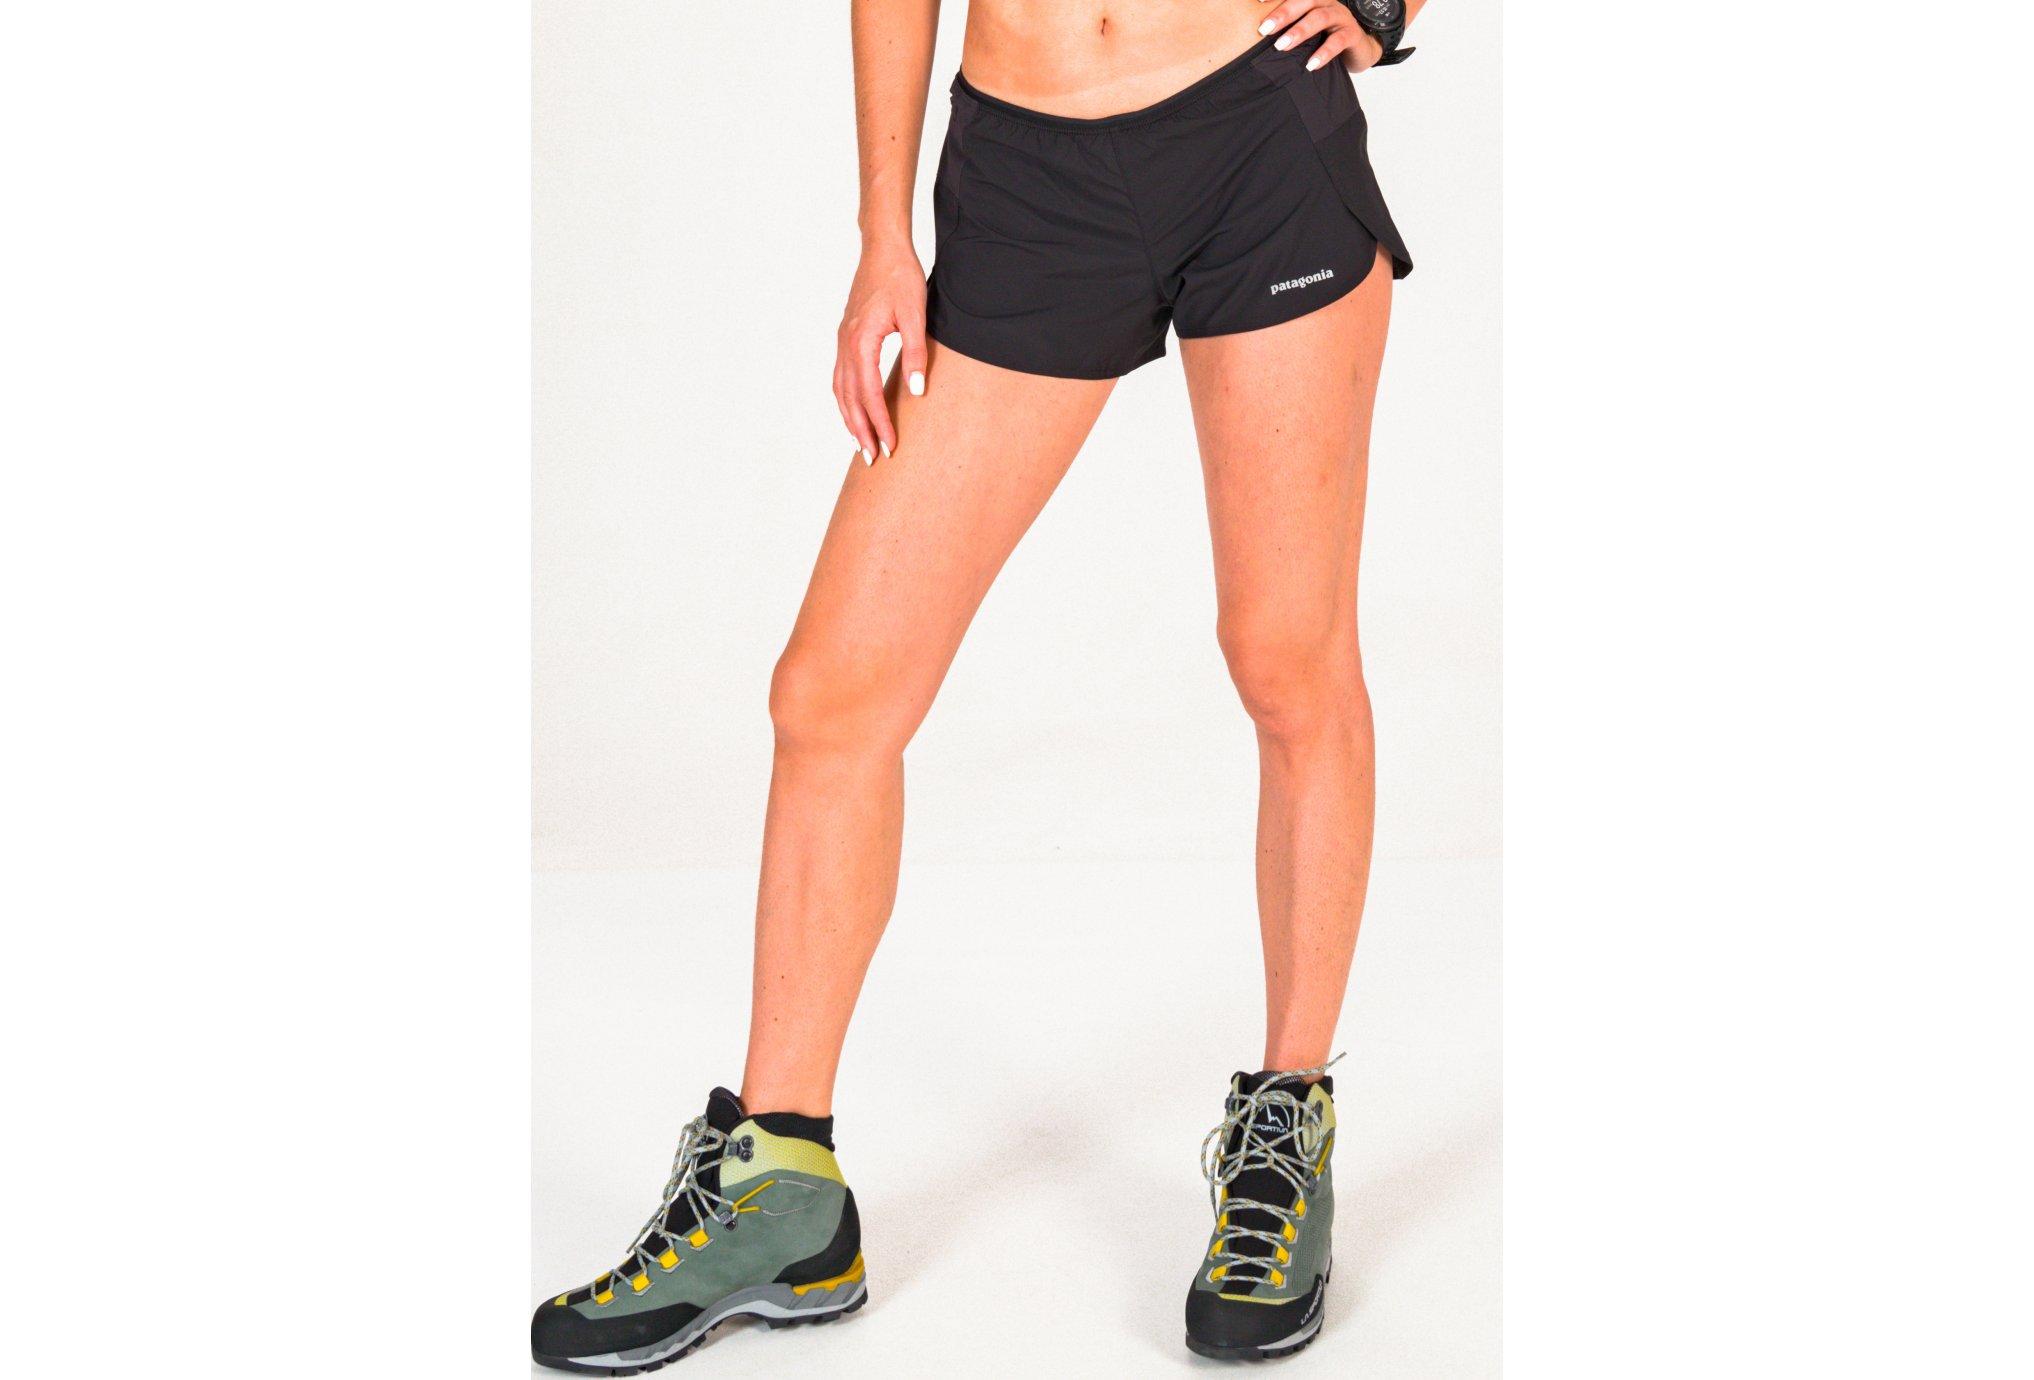 Patagonia Strider Pro W vêtement running femme